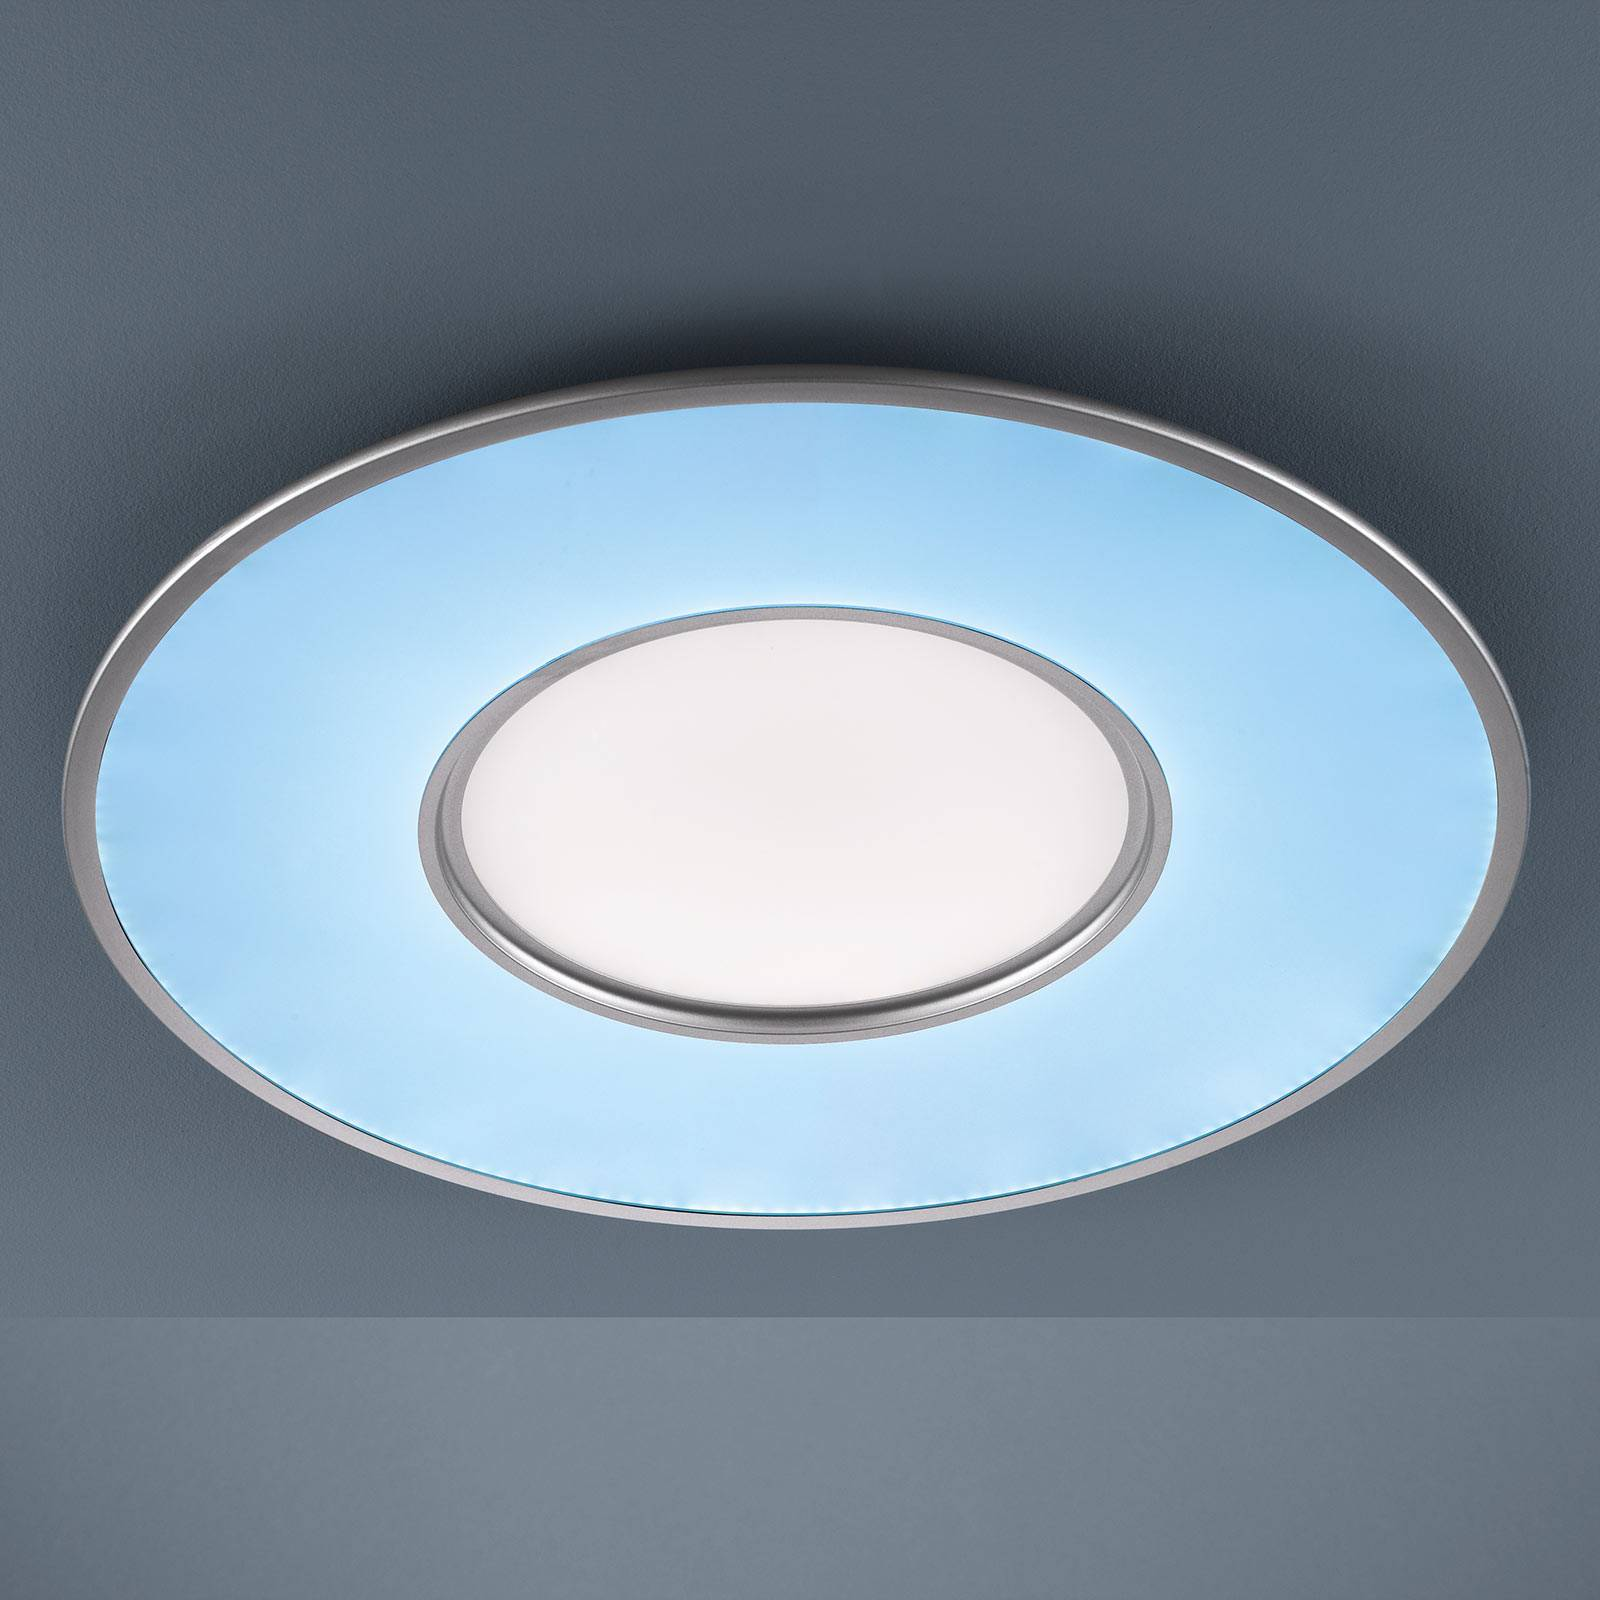 Lampa sufitowa LED Mia z CCT i pilotem